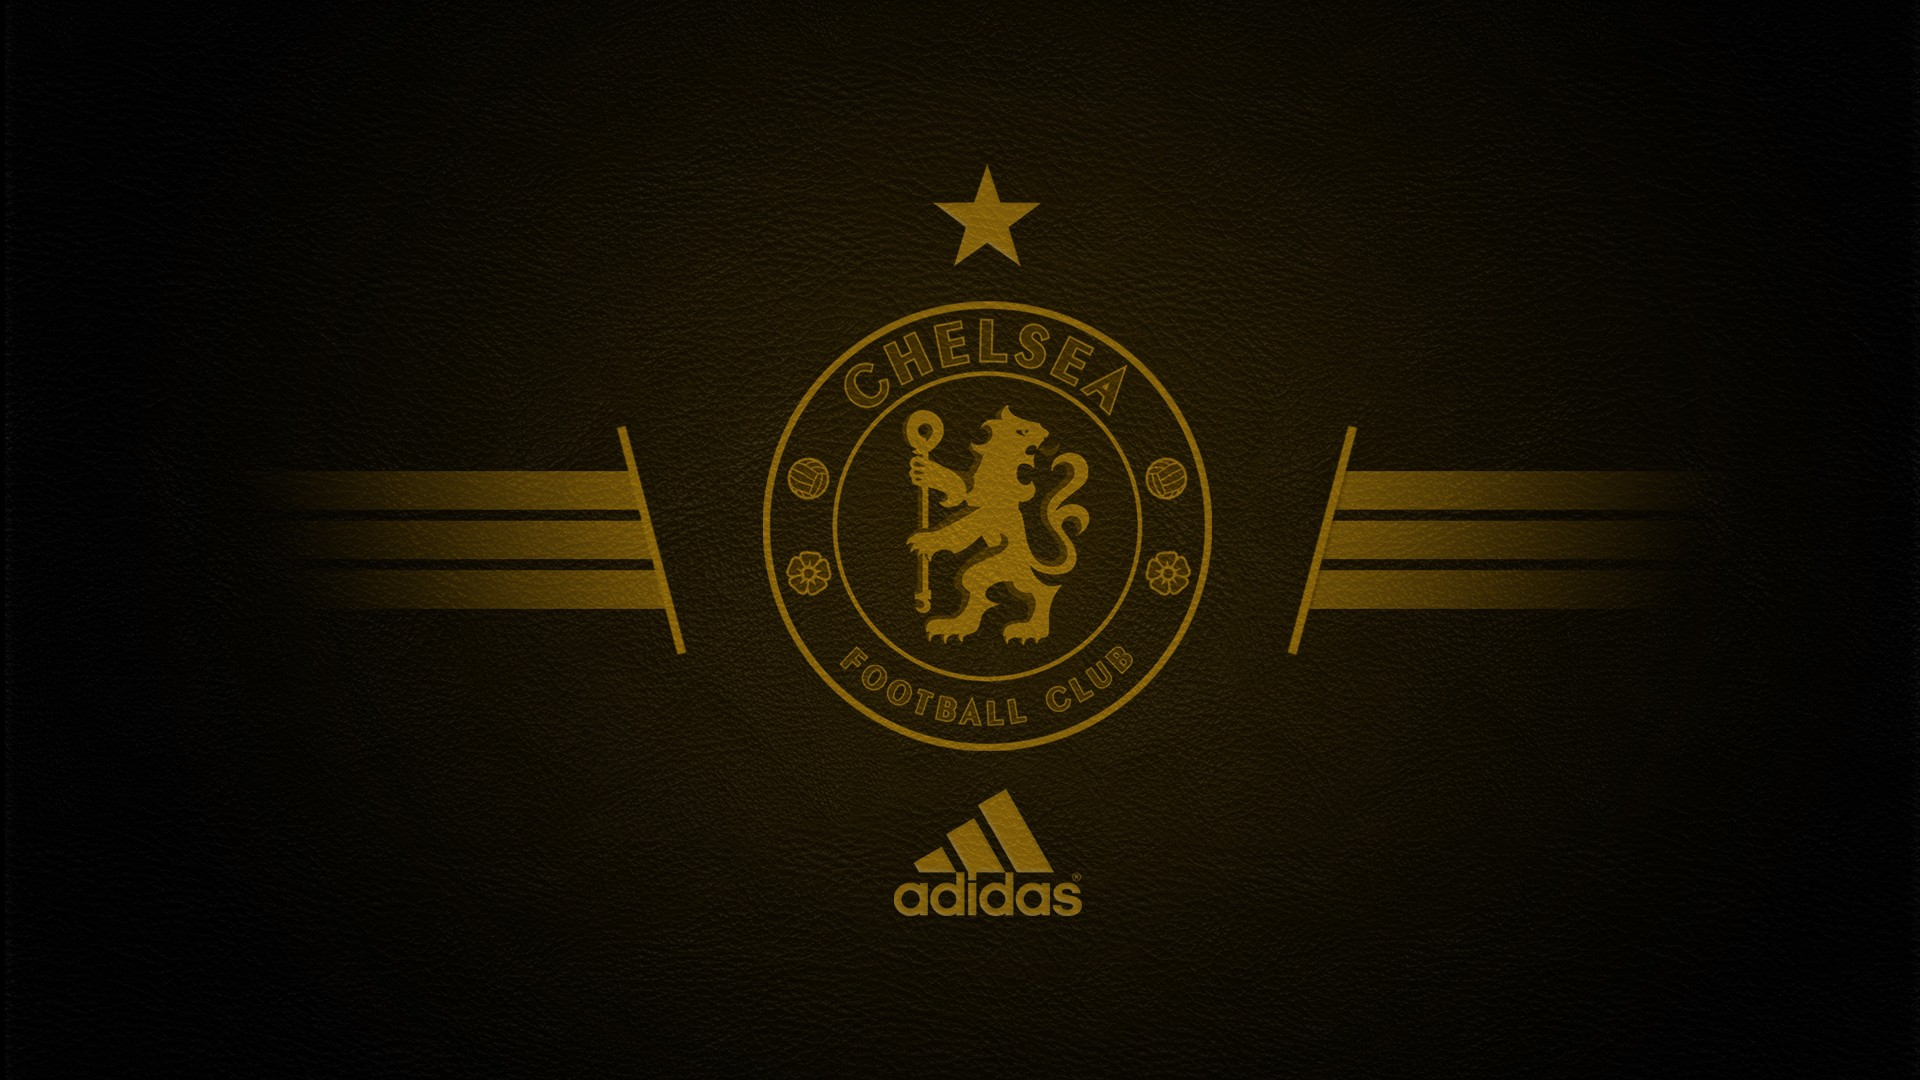 Messi Hd Wallpapers 1080p Download Free Adidas Soccer Background Pixelstalk Net